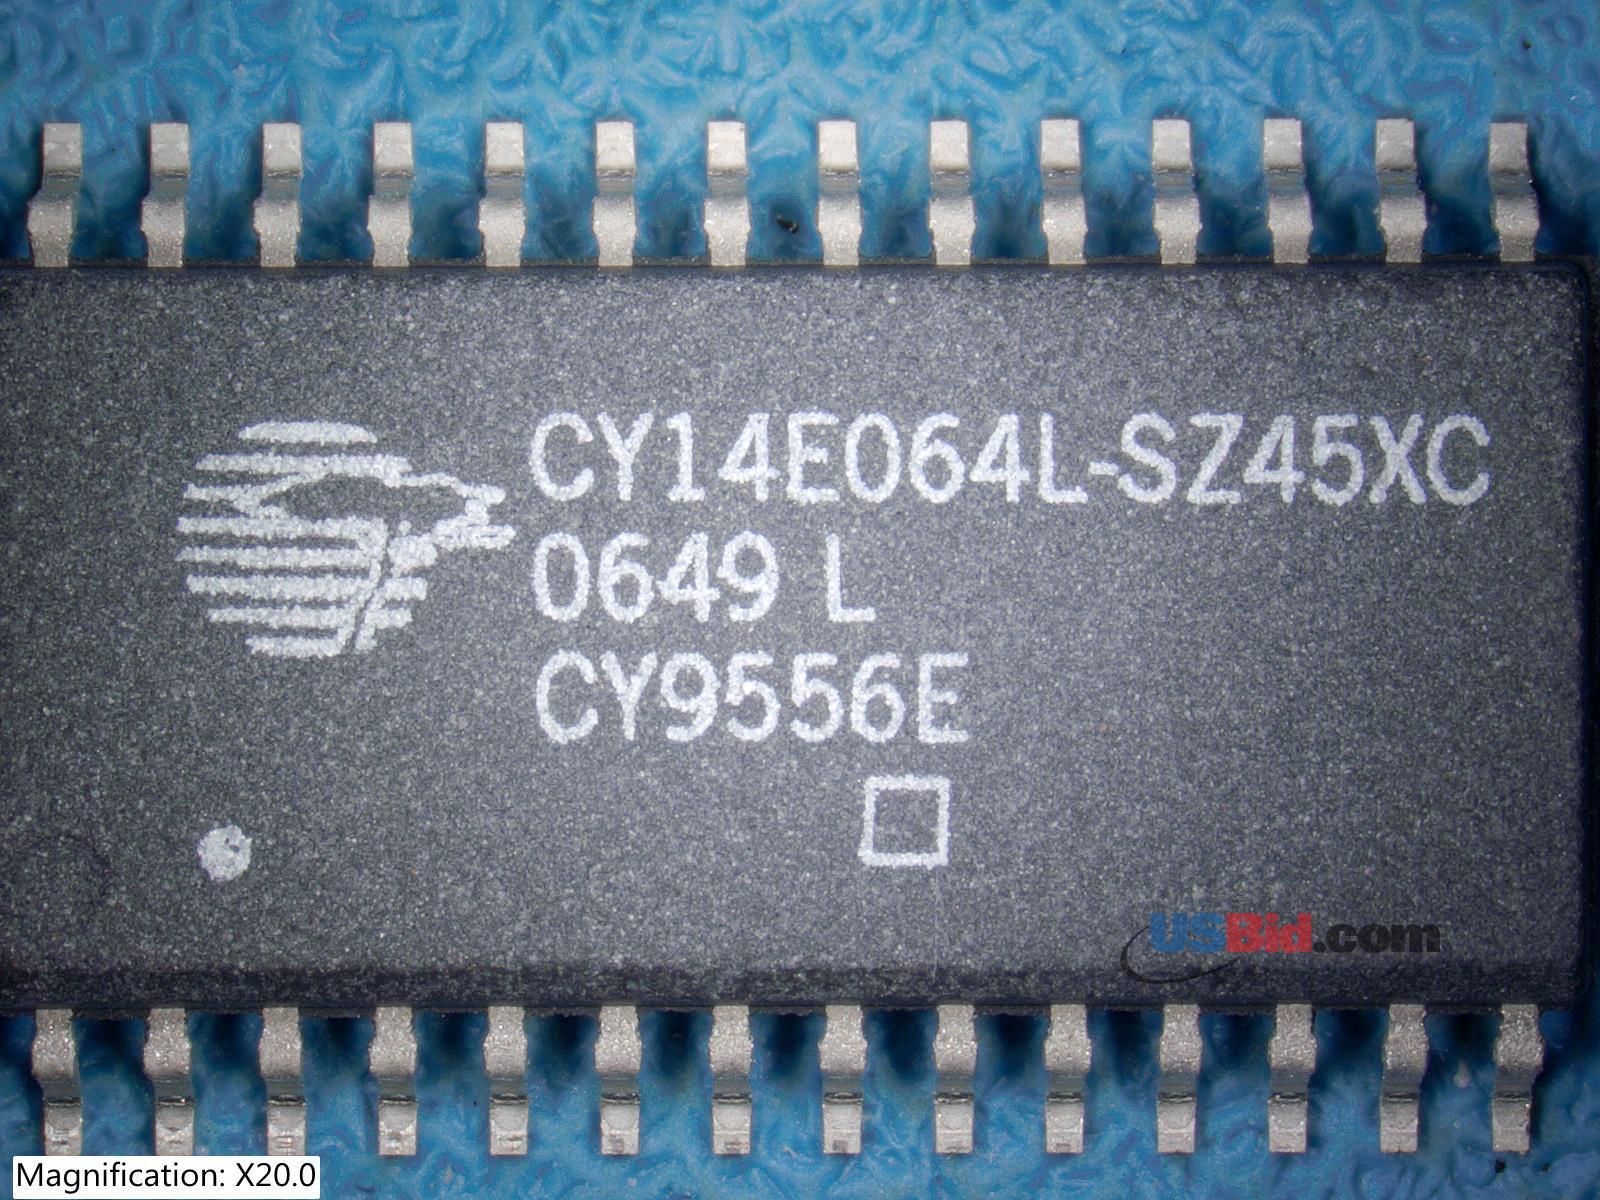 CY14E064L-SZ45XC photos